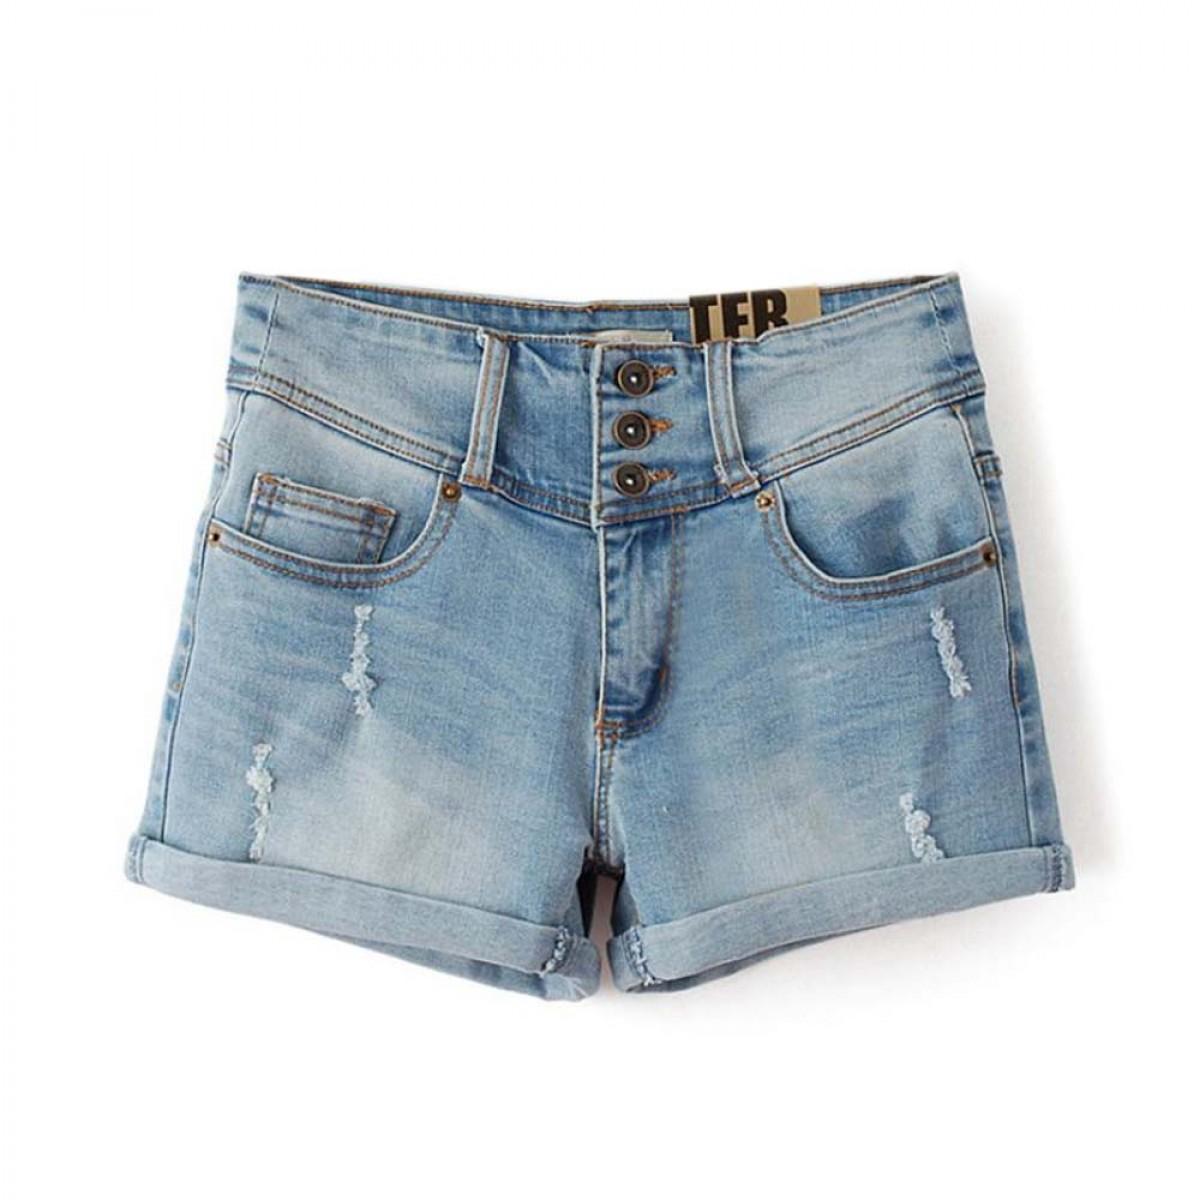 90 s Light Denim Shorts Loose Fit Women | LATICCI